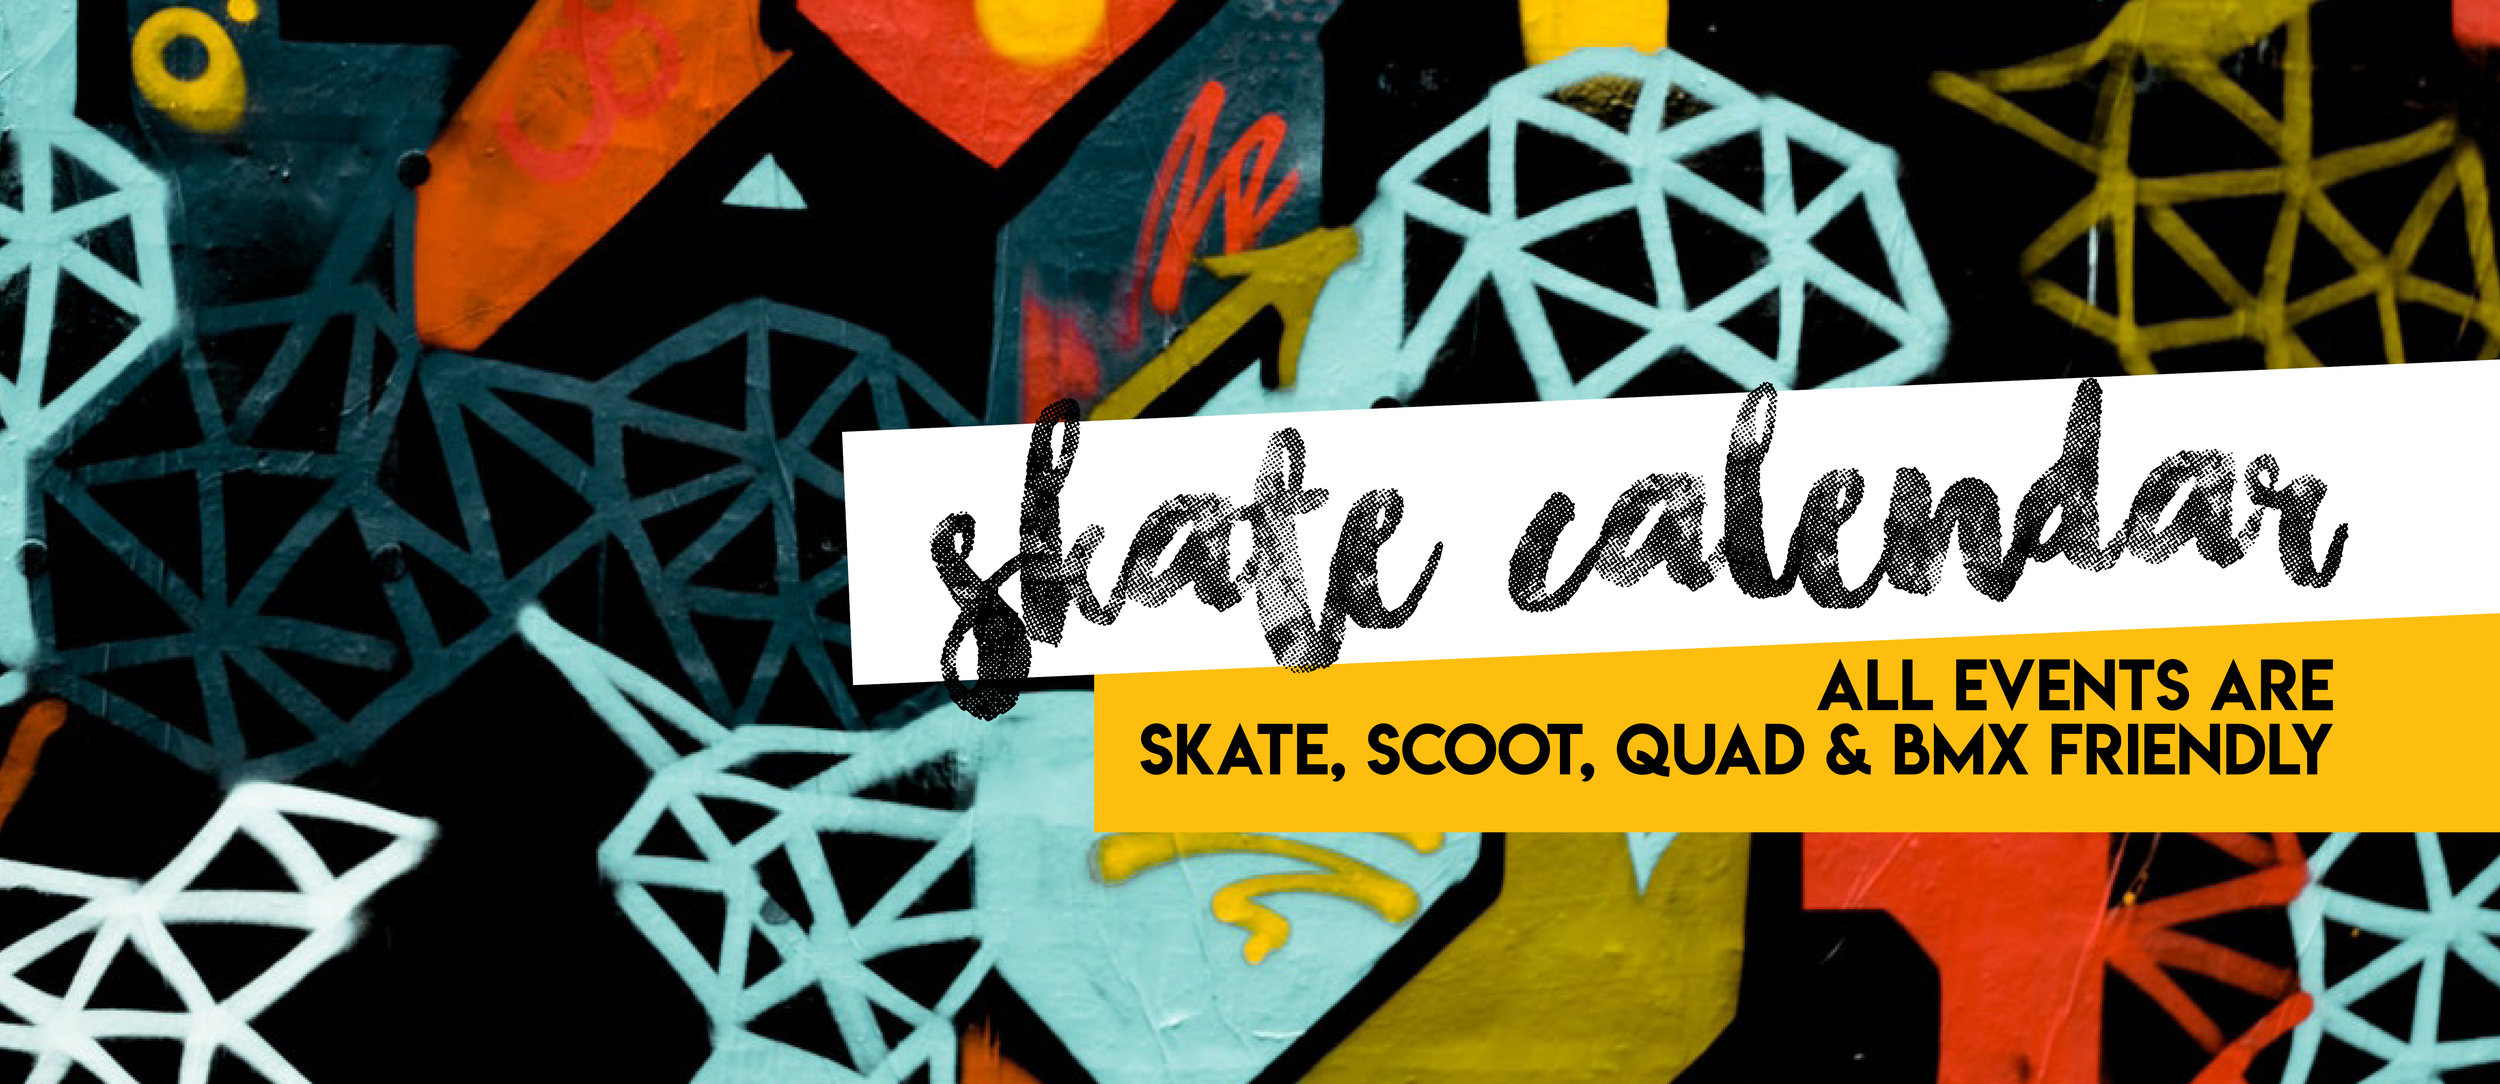 2019 Skate Calendar - March - December